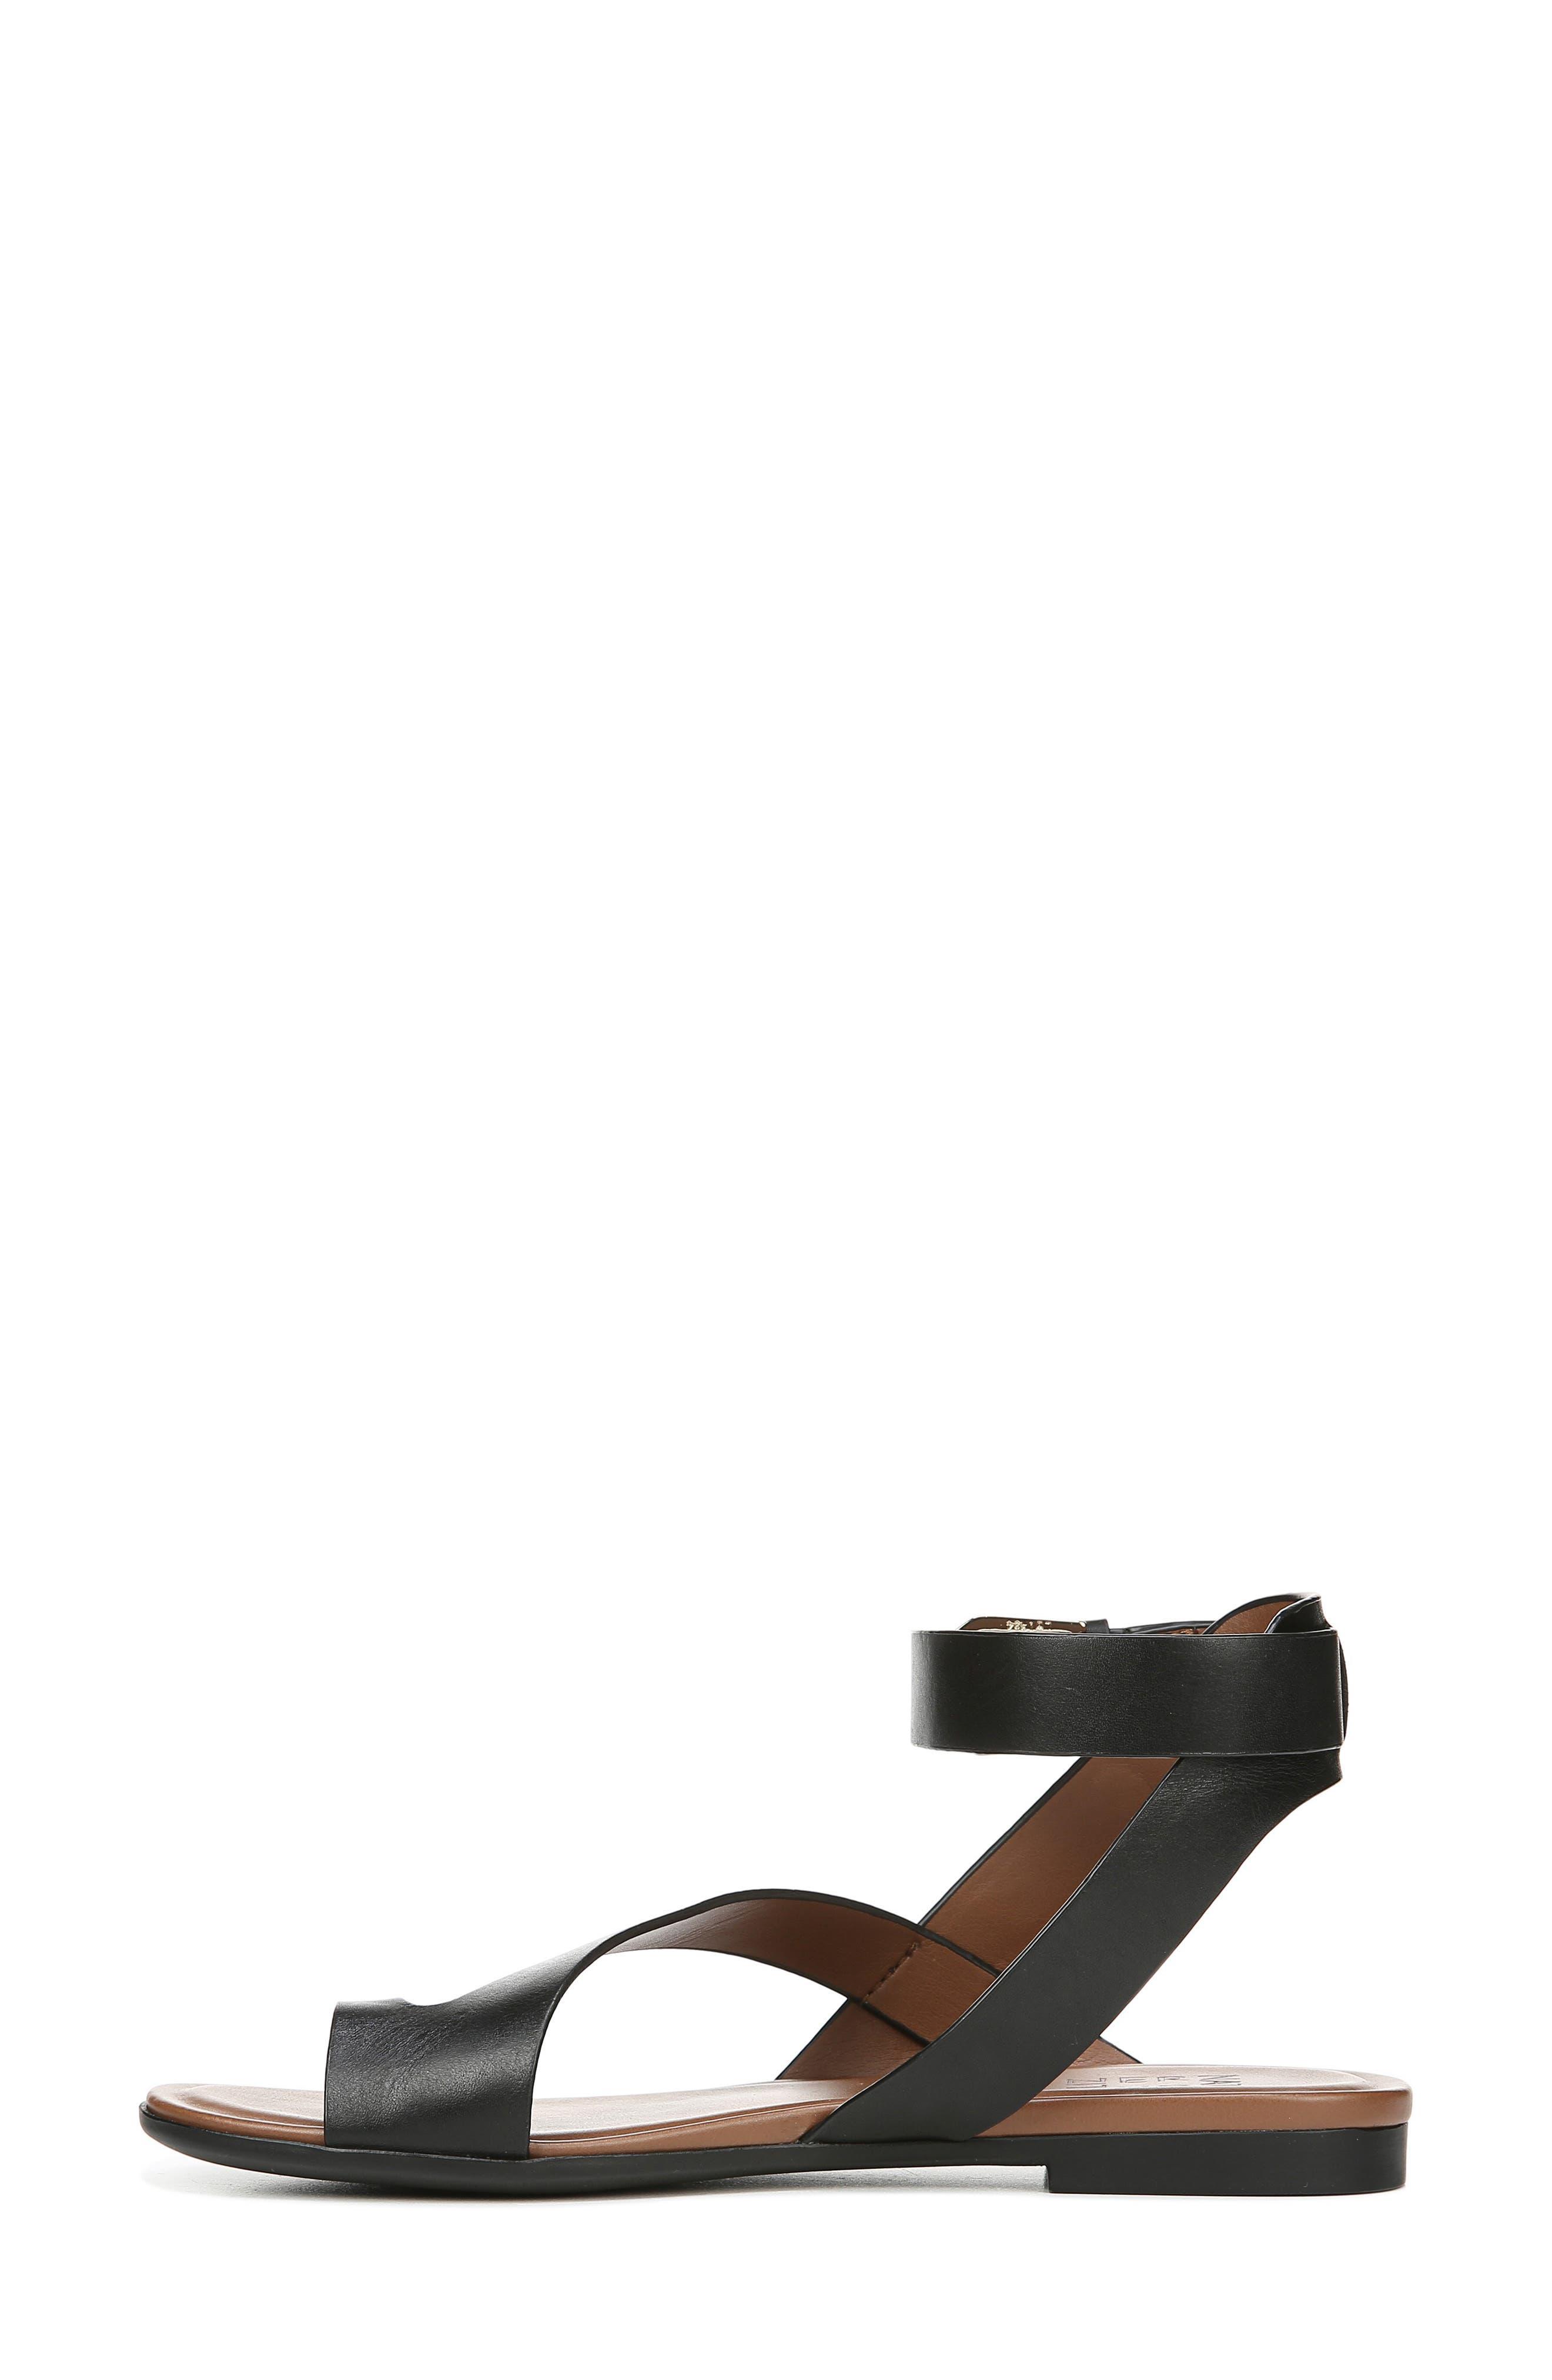 Tally Ankle Strap Sandal,                             Alternate thumbnail 9, color,                             BLACK LEATHER